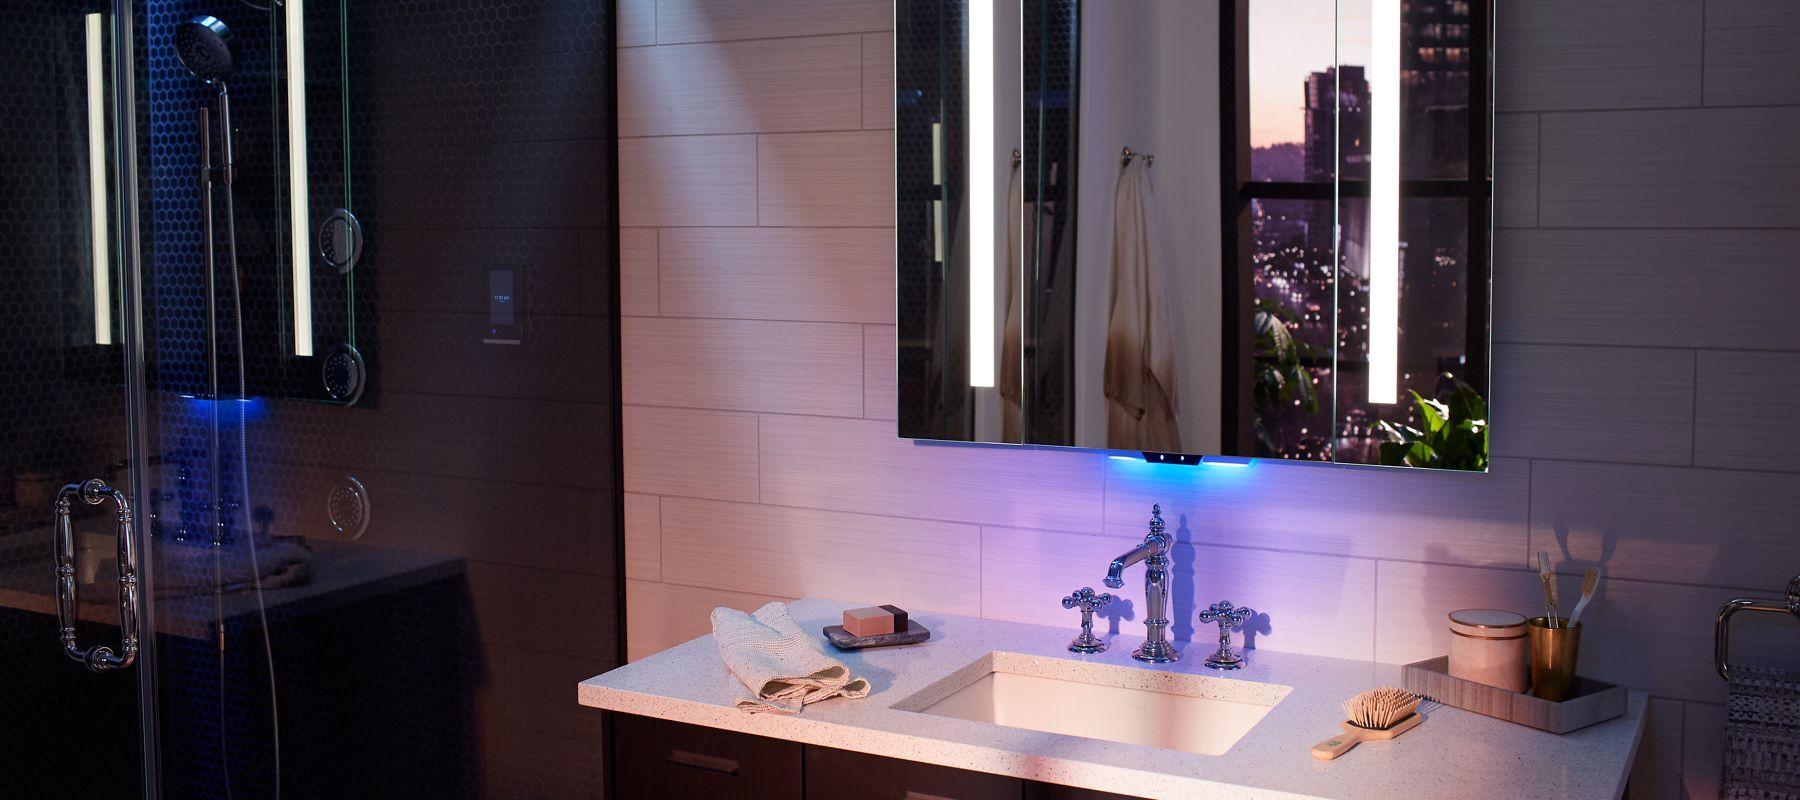 Verdera Revival Bathroom Mirrors Bathroom Kohler Small